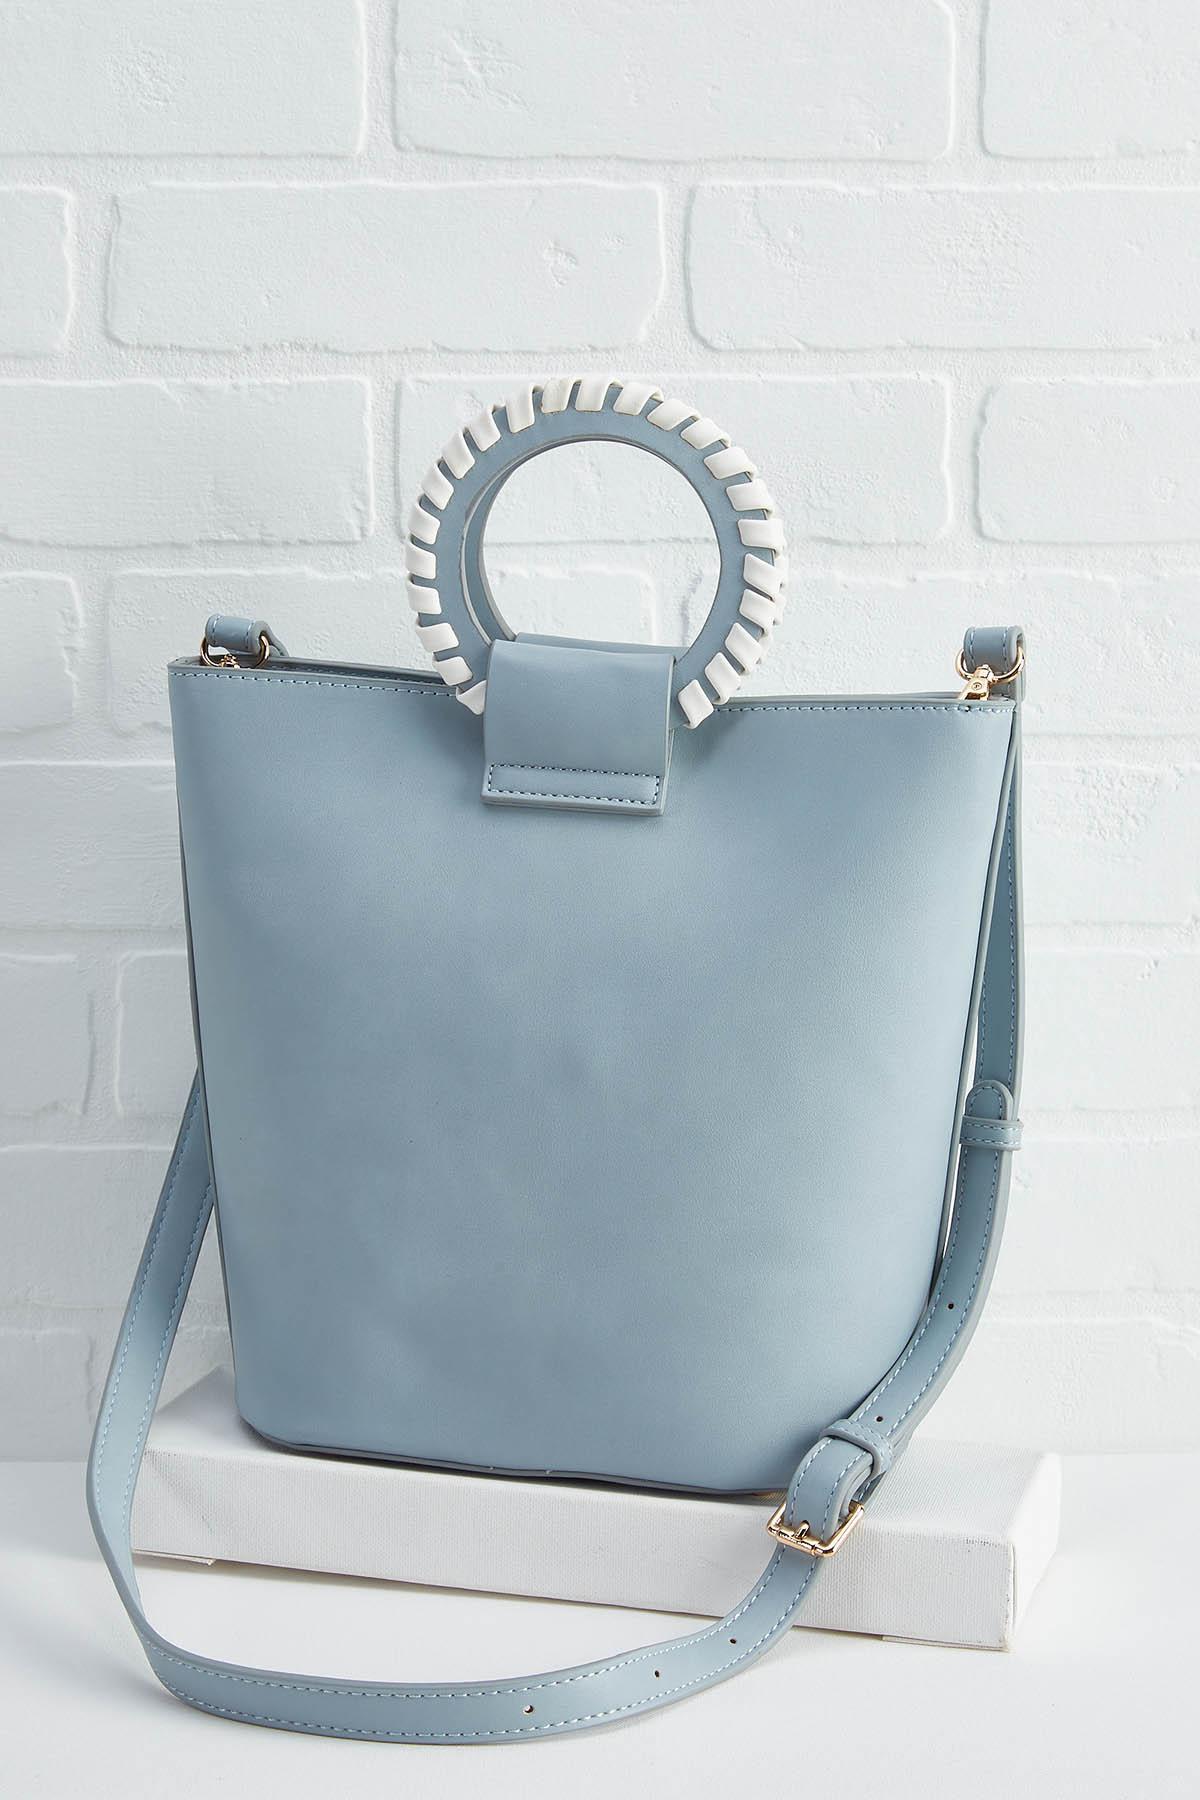 Feeling Blue Bag